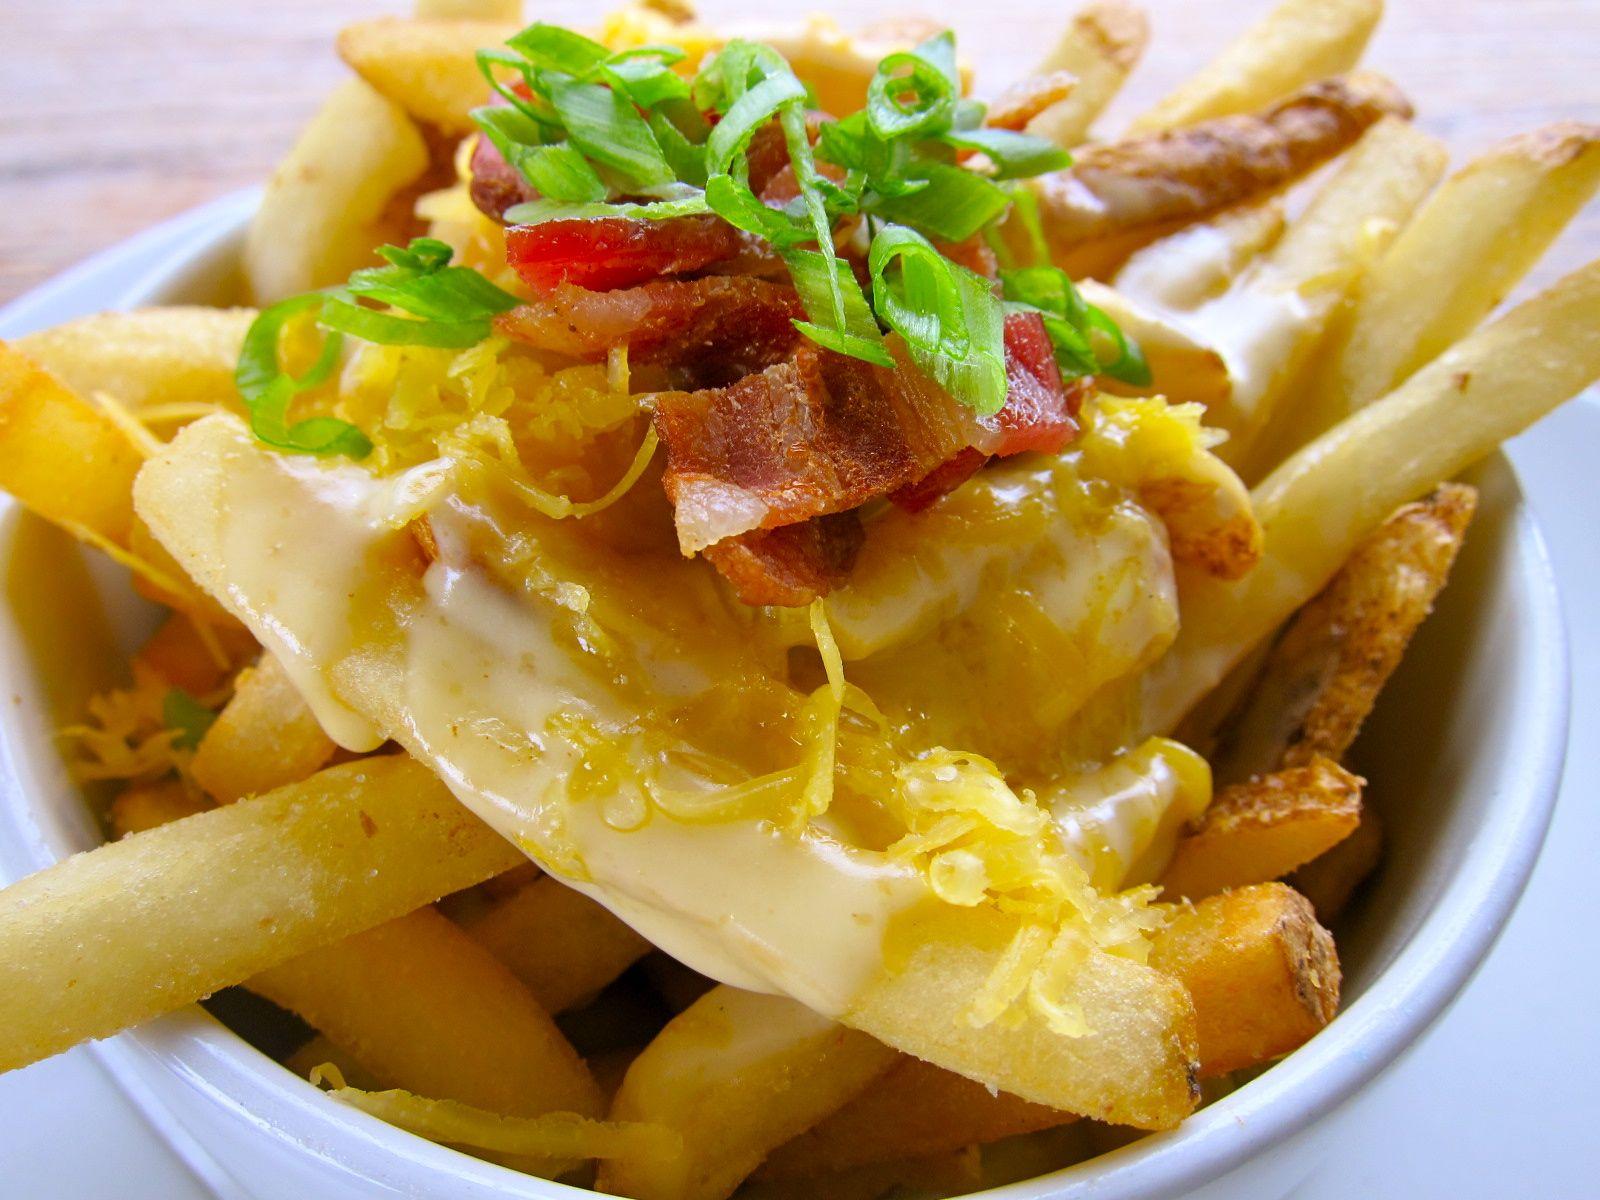 fado irish pub introduces new menu and special offers